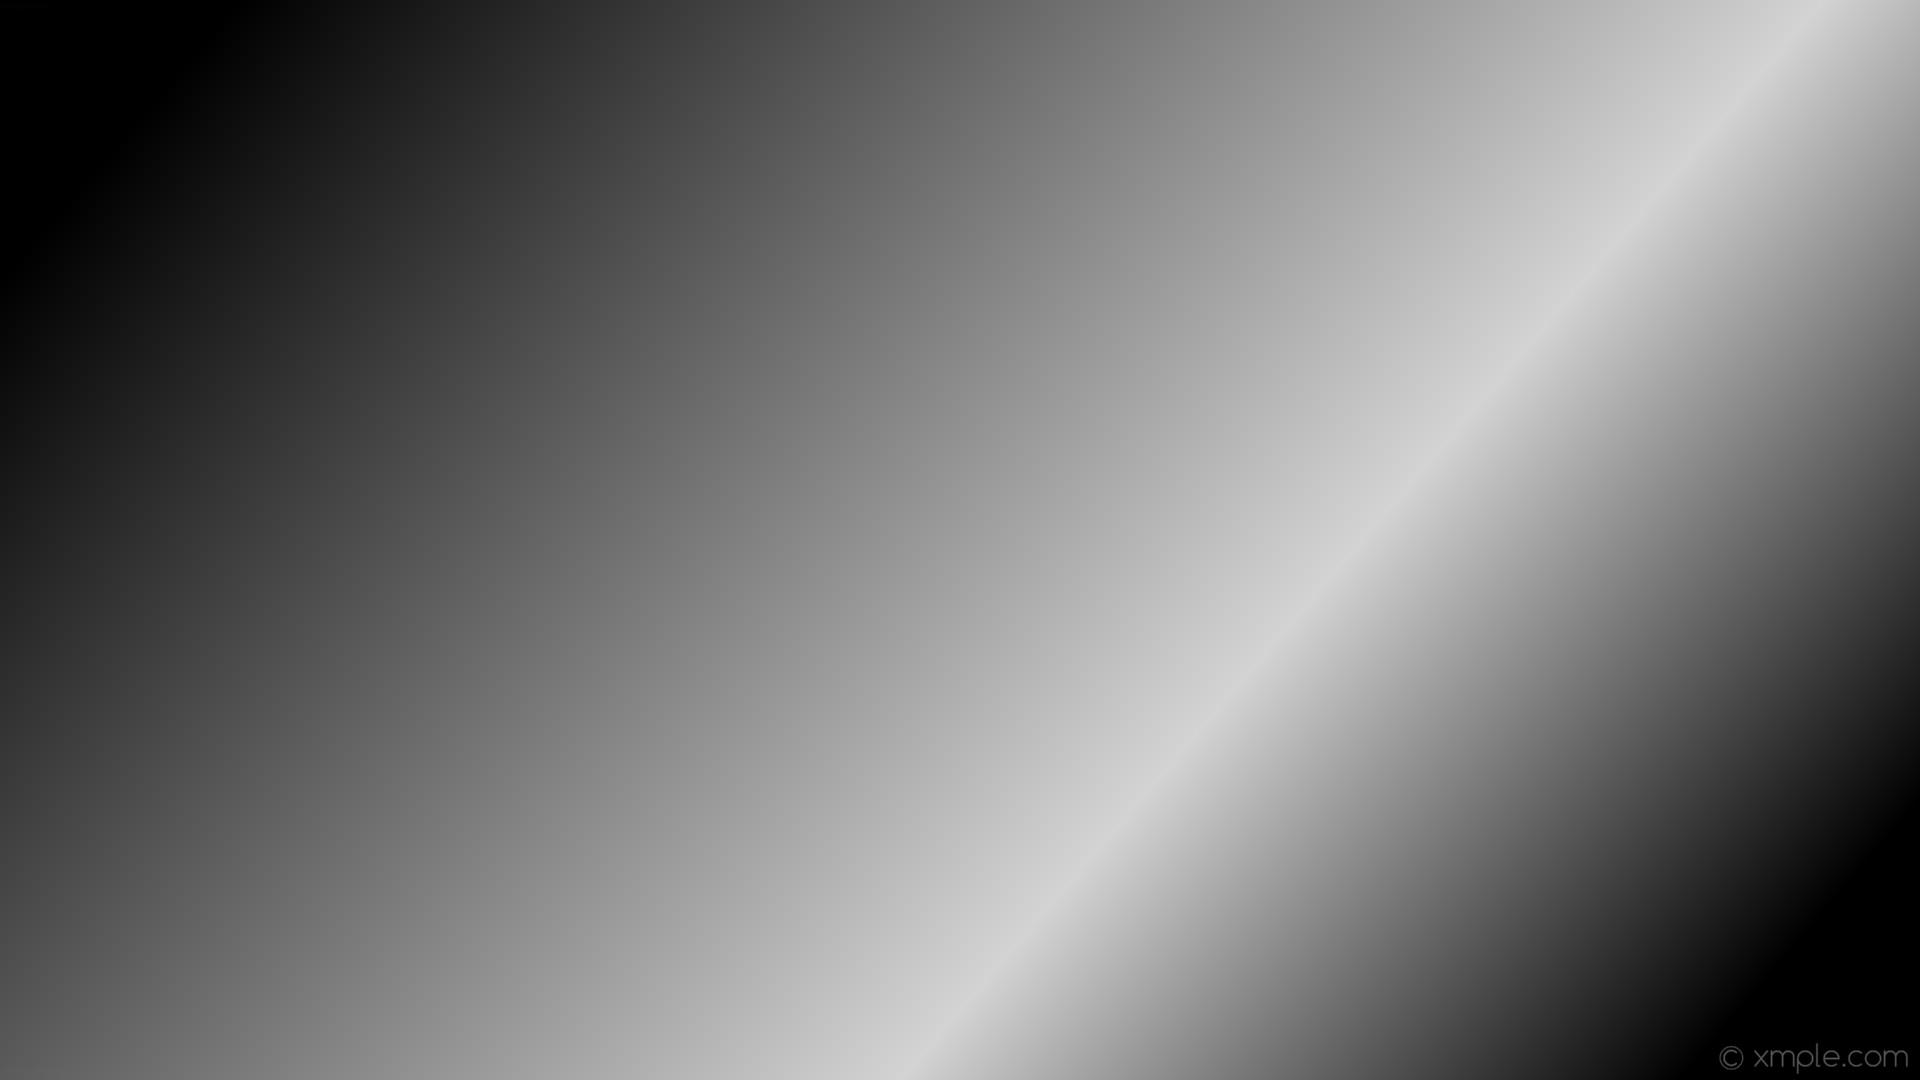 wallpaper linear highlight black gradient grey light gray #000000 #d3d3d3  165° 67%